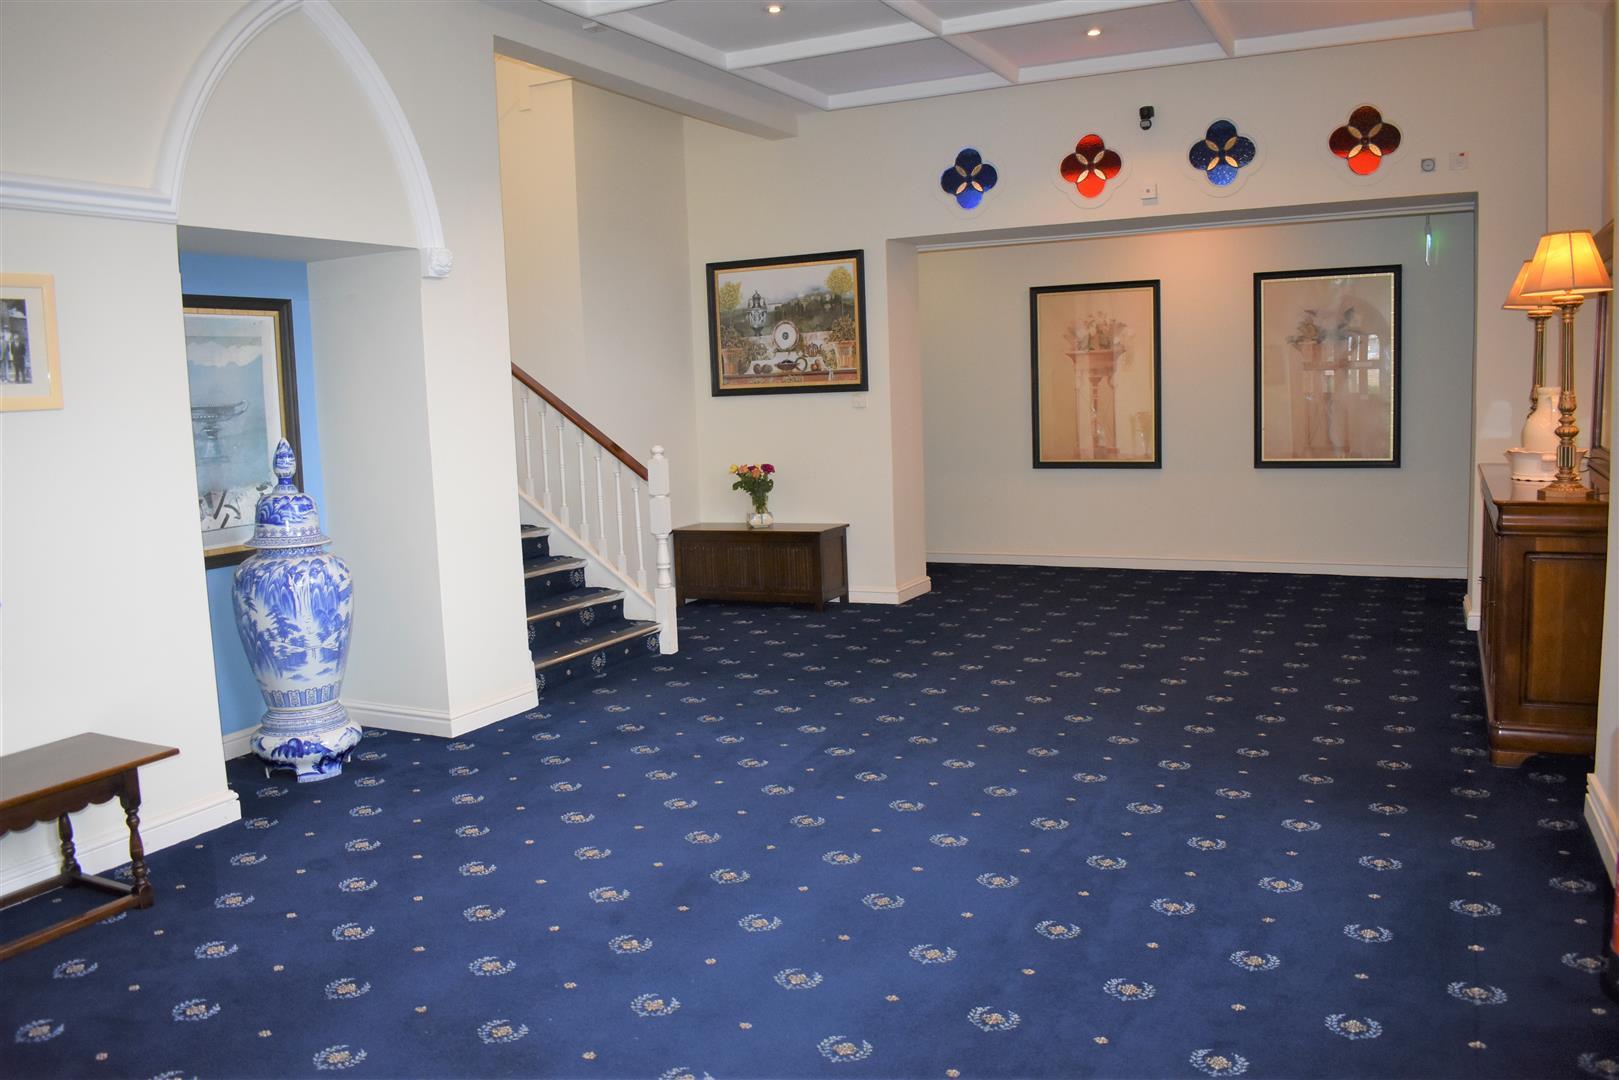 Rembrandt Court, Sketty, Swansea, SA2 9FG